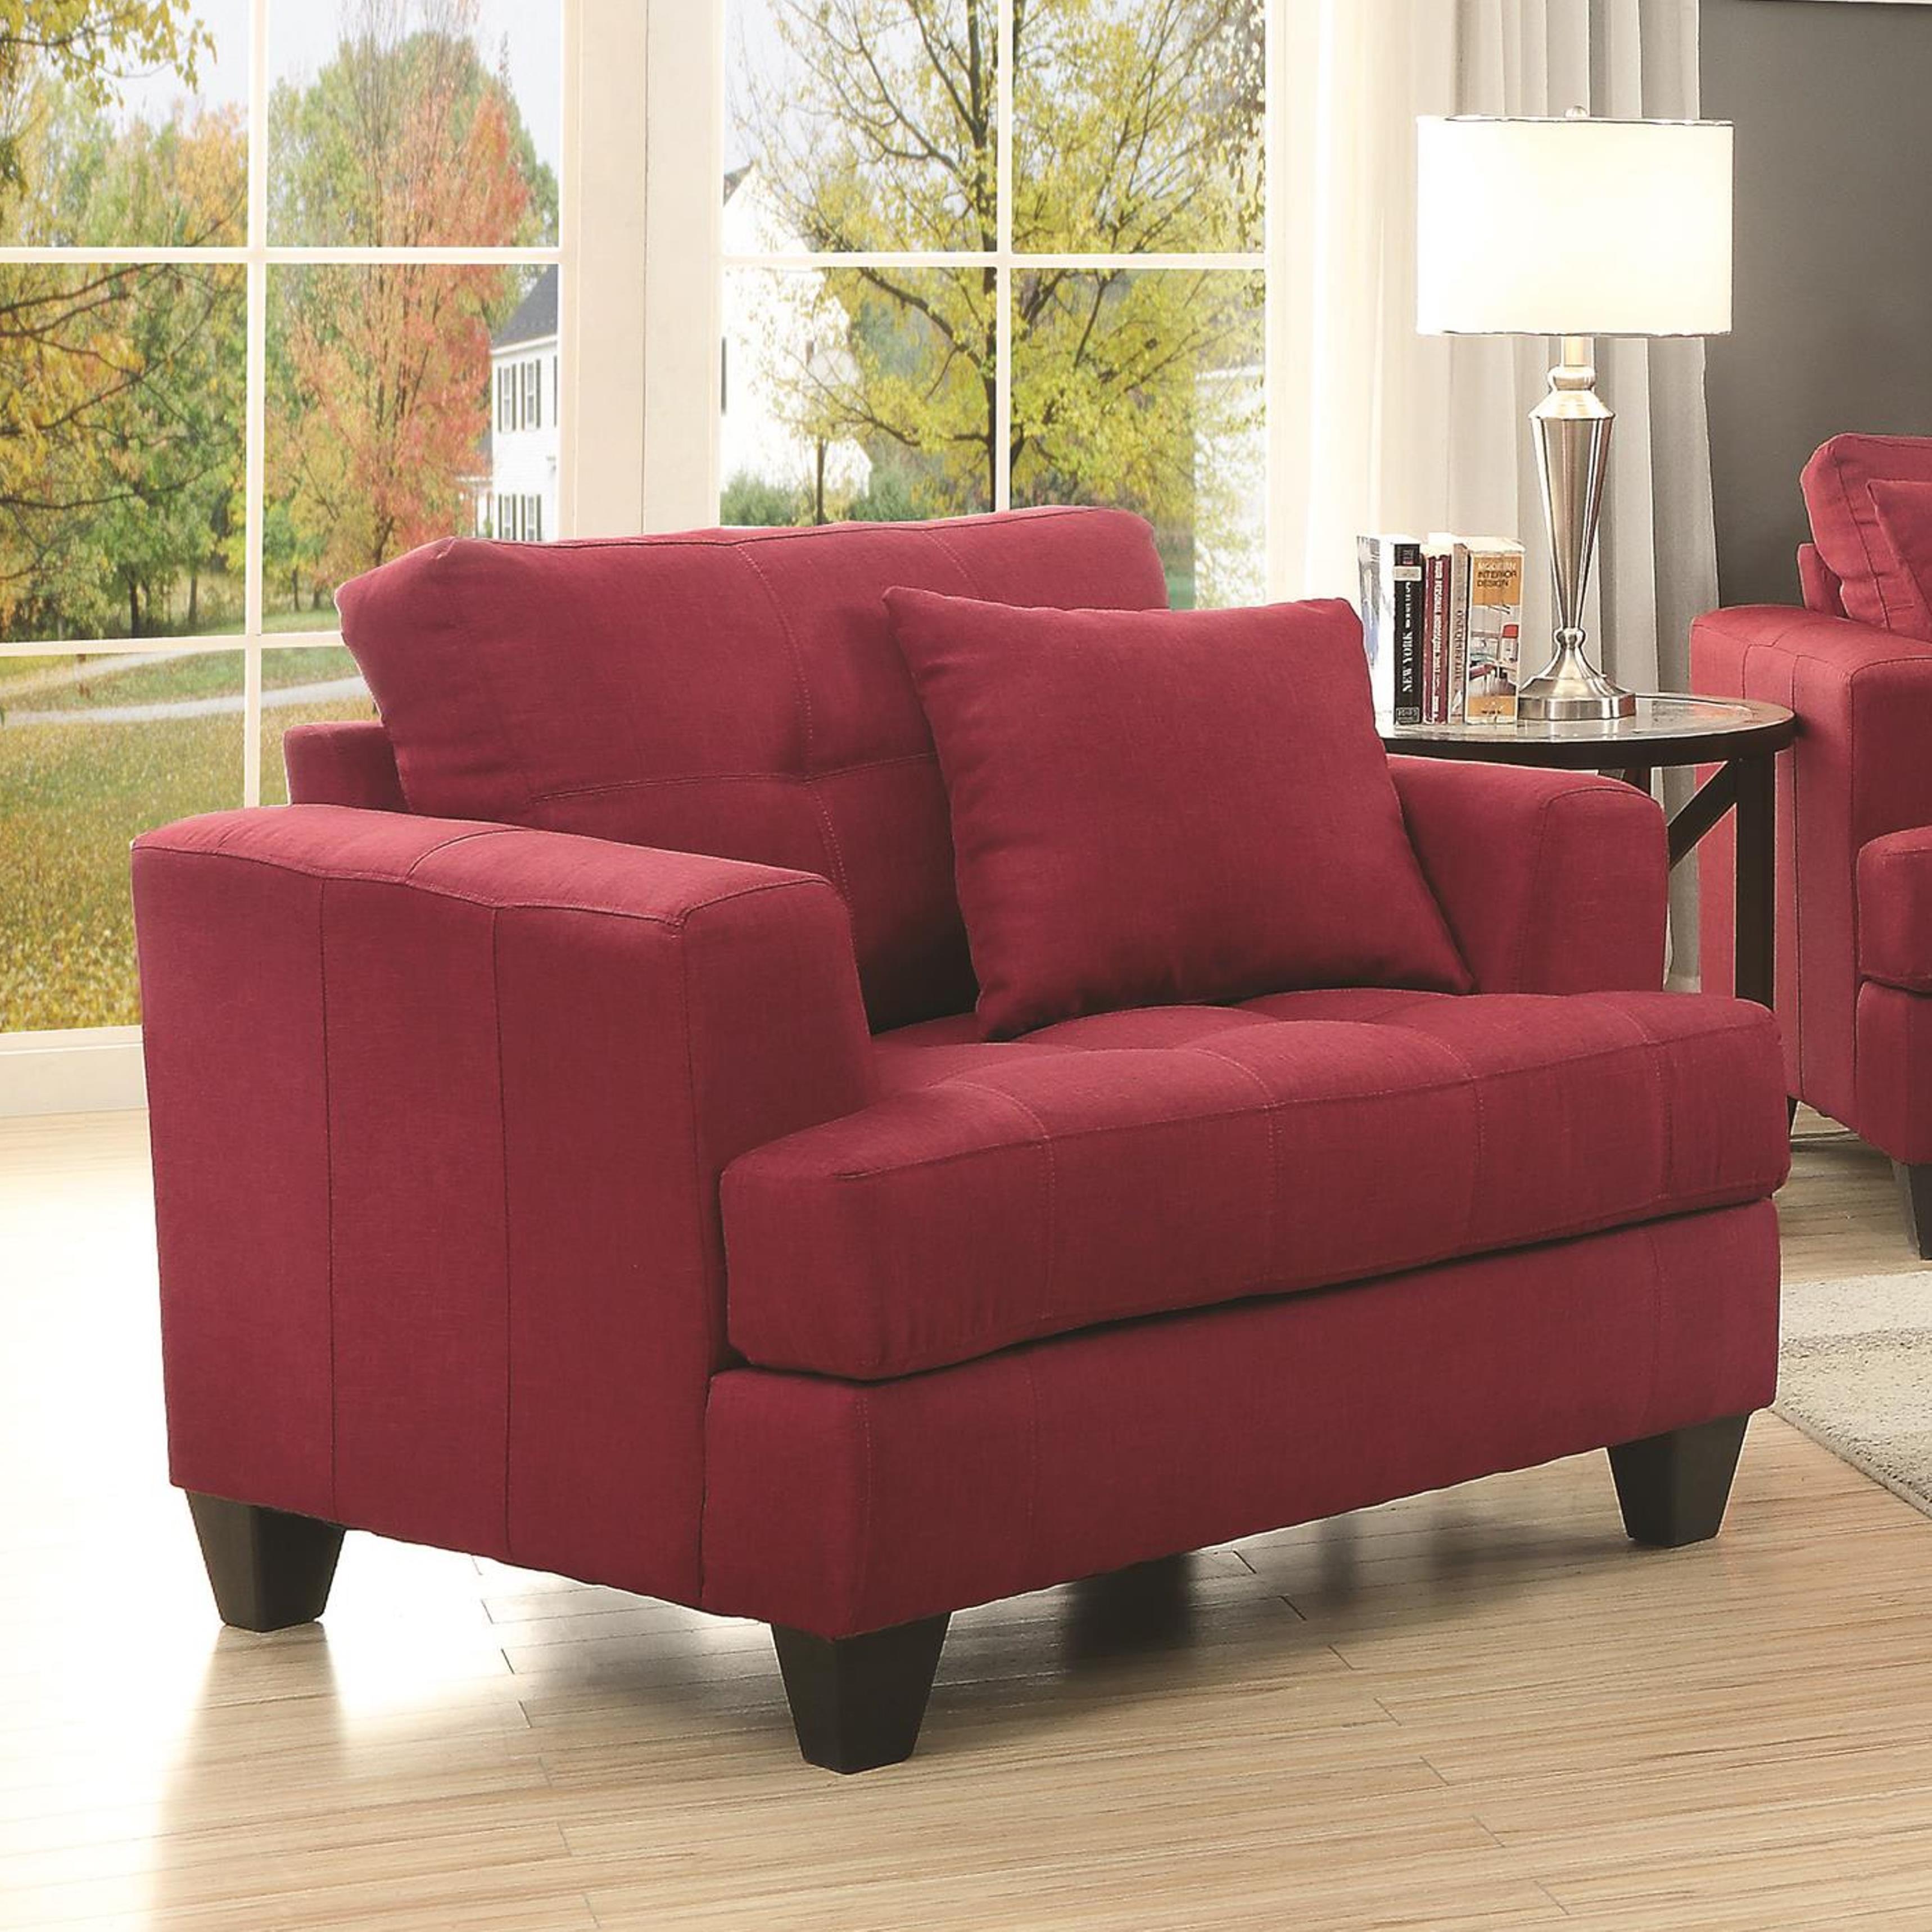 Sofas Frankfurt sofa frankfurt westhausen sofa by ferdinand kramer through e as